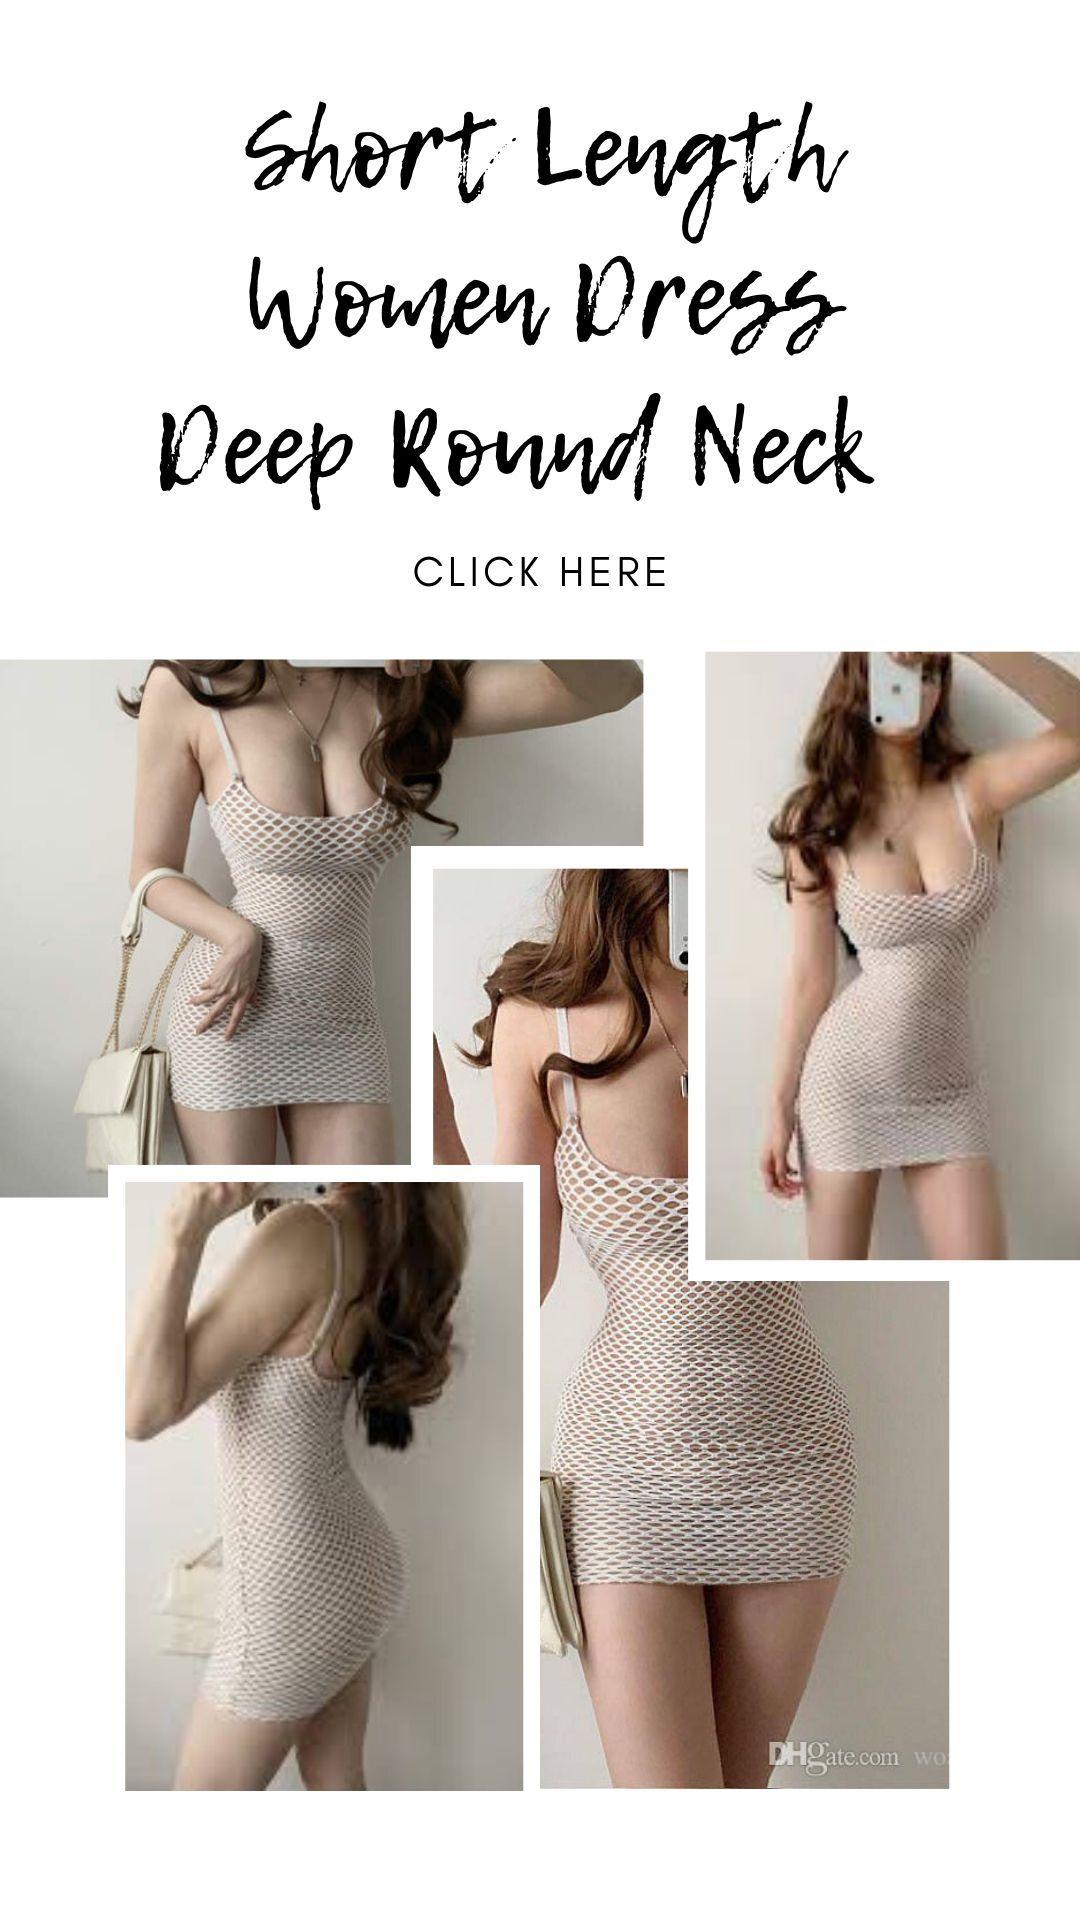 Short Length Women Dress Deep Round Neck #girl #girls #model #shoes #styles #outfit #instaheels #fashionshoes #shoelover #instashoes #highheelshoes #heelsaddict #loveheels #iloveheels #shoestagram